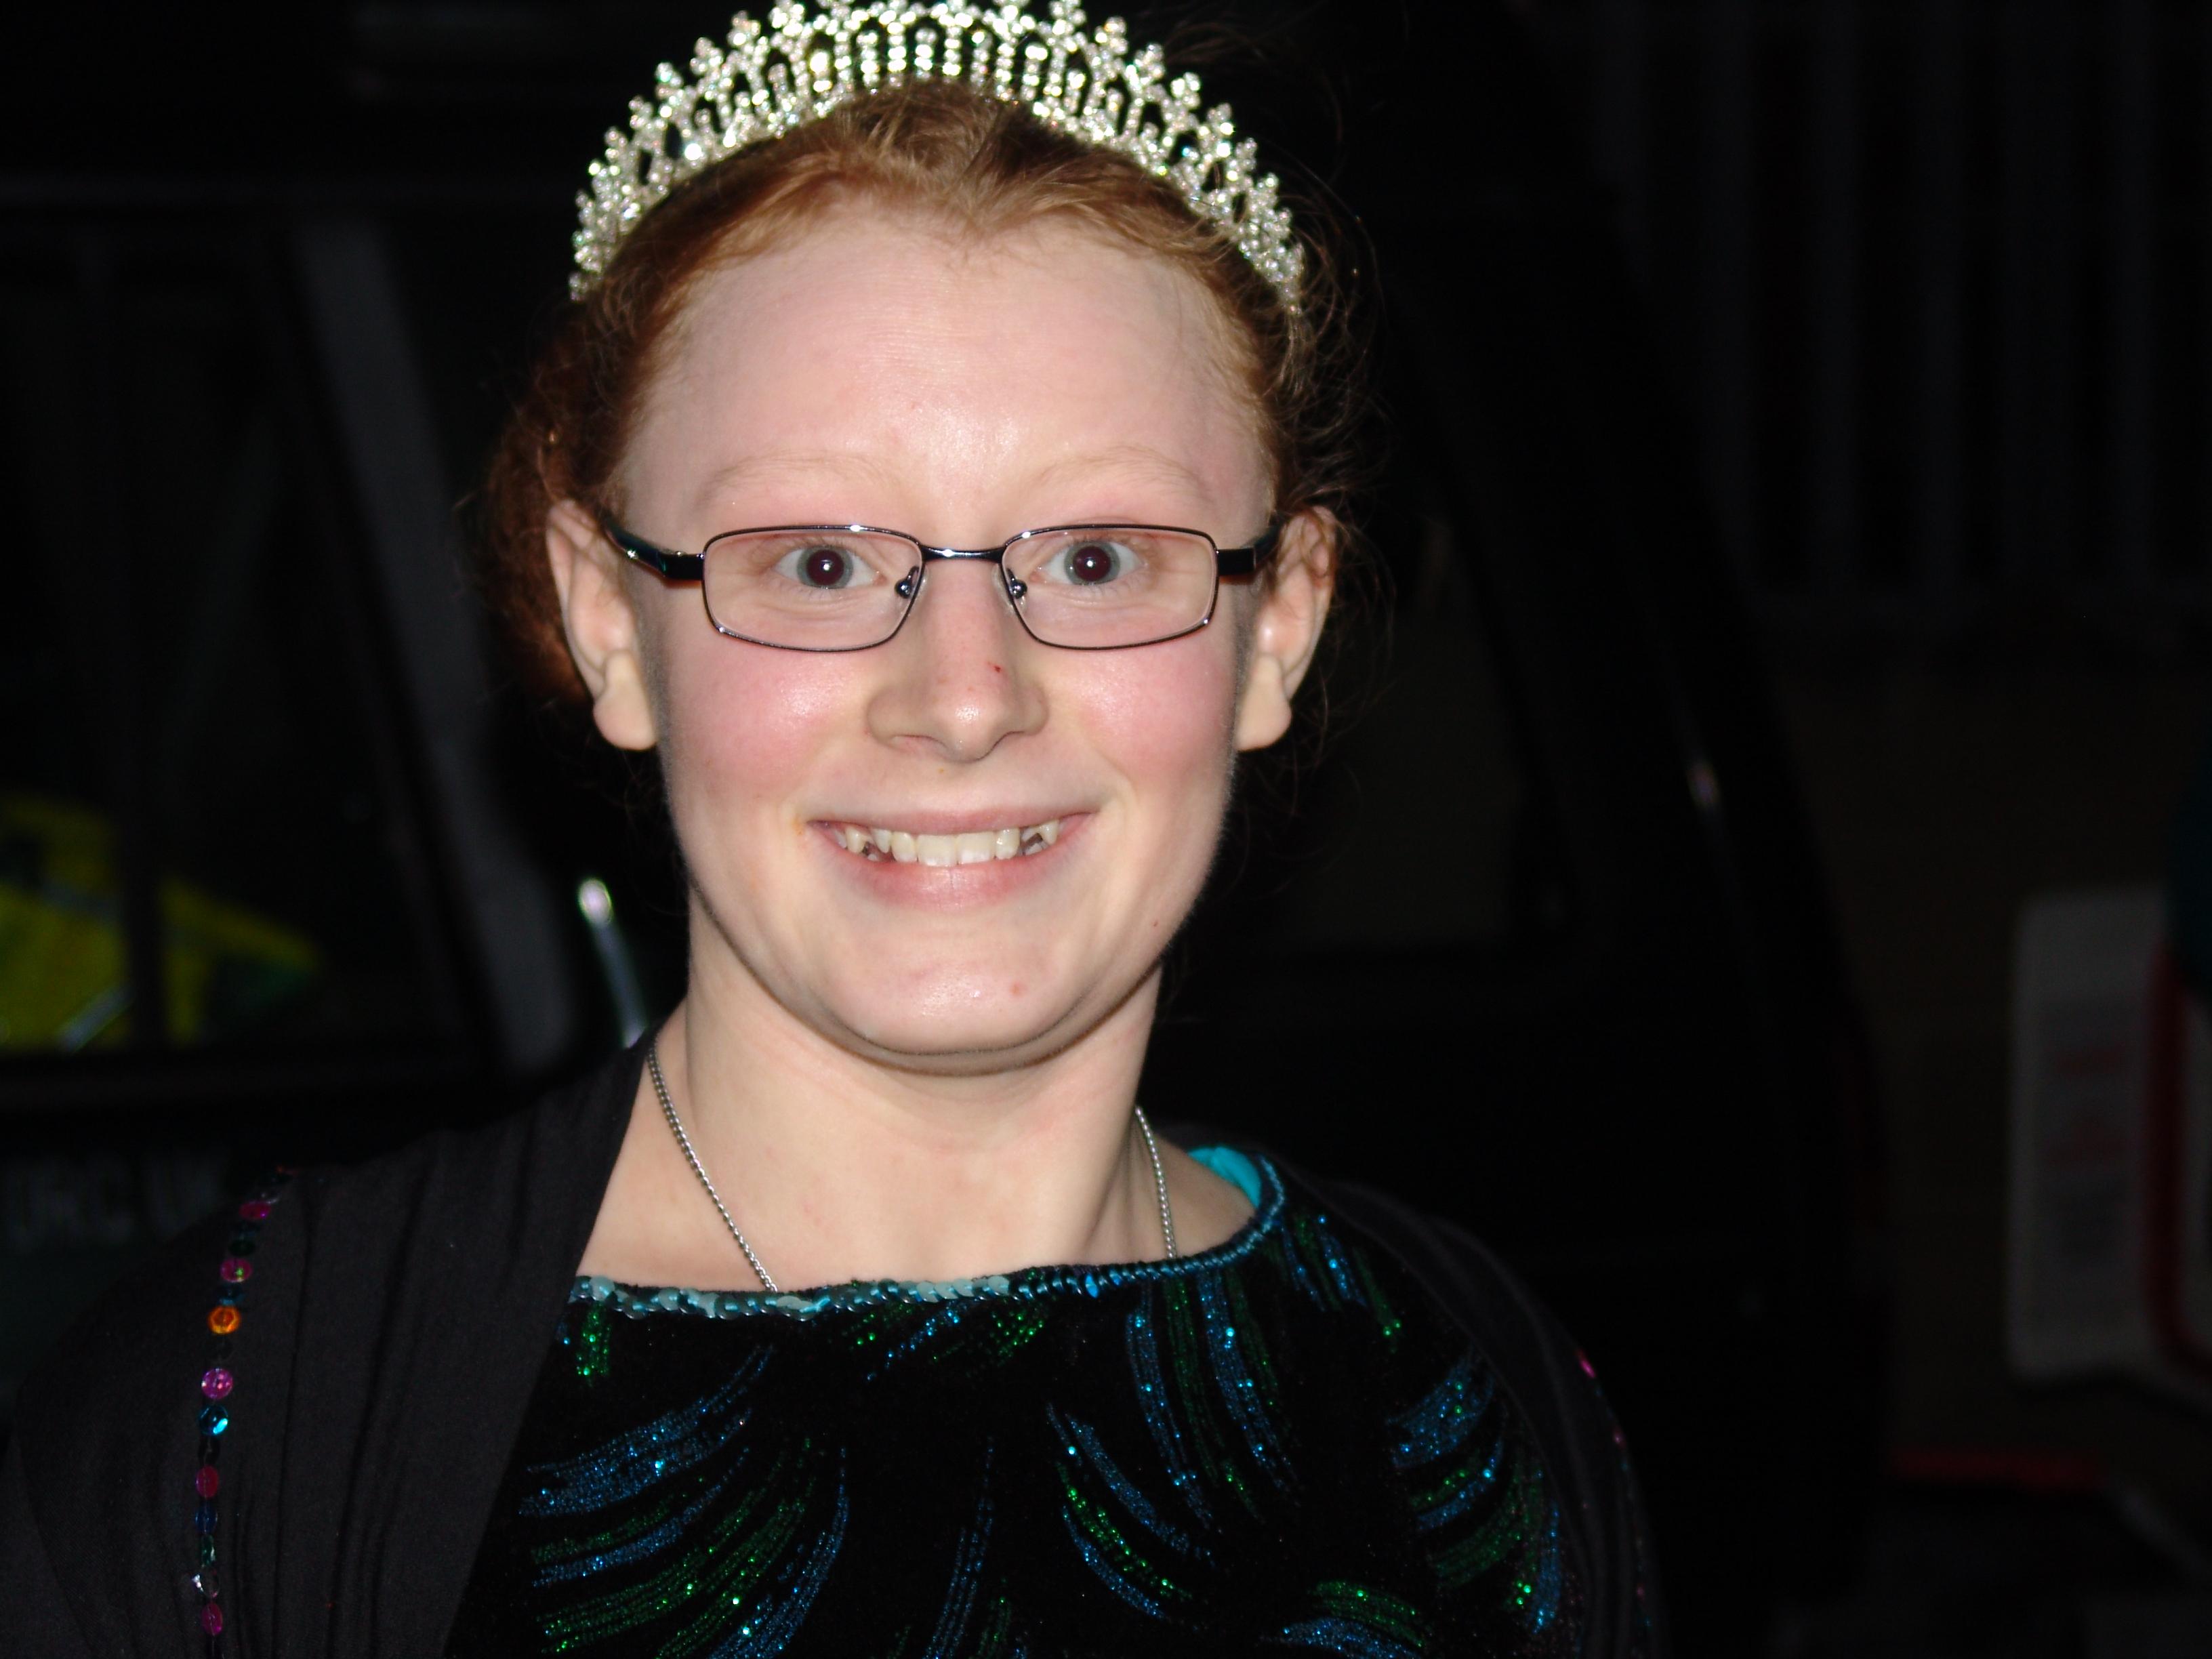 Eloise- Ventnor Senior Princess